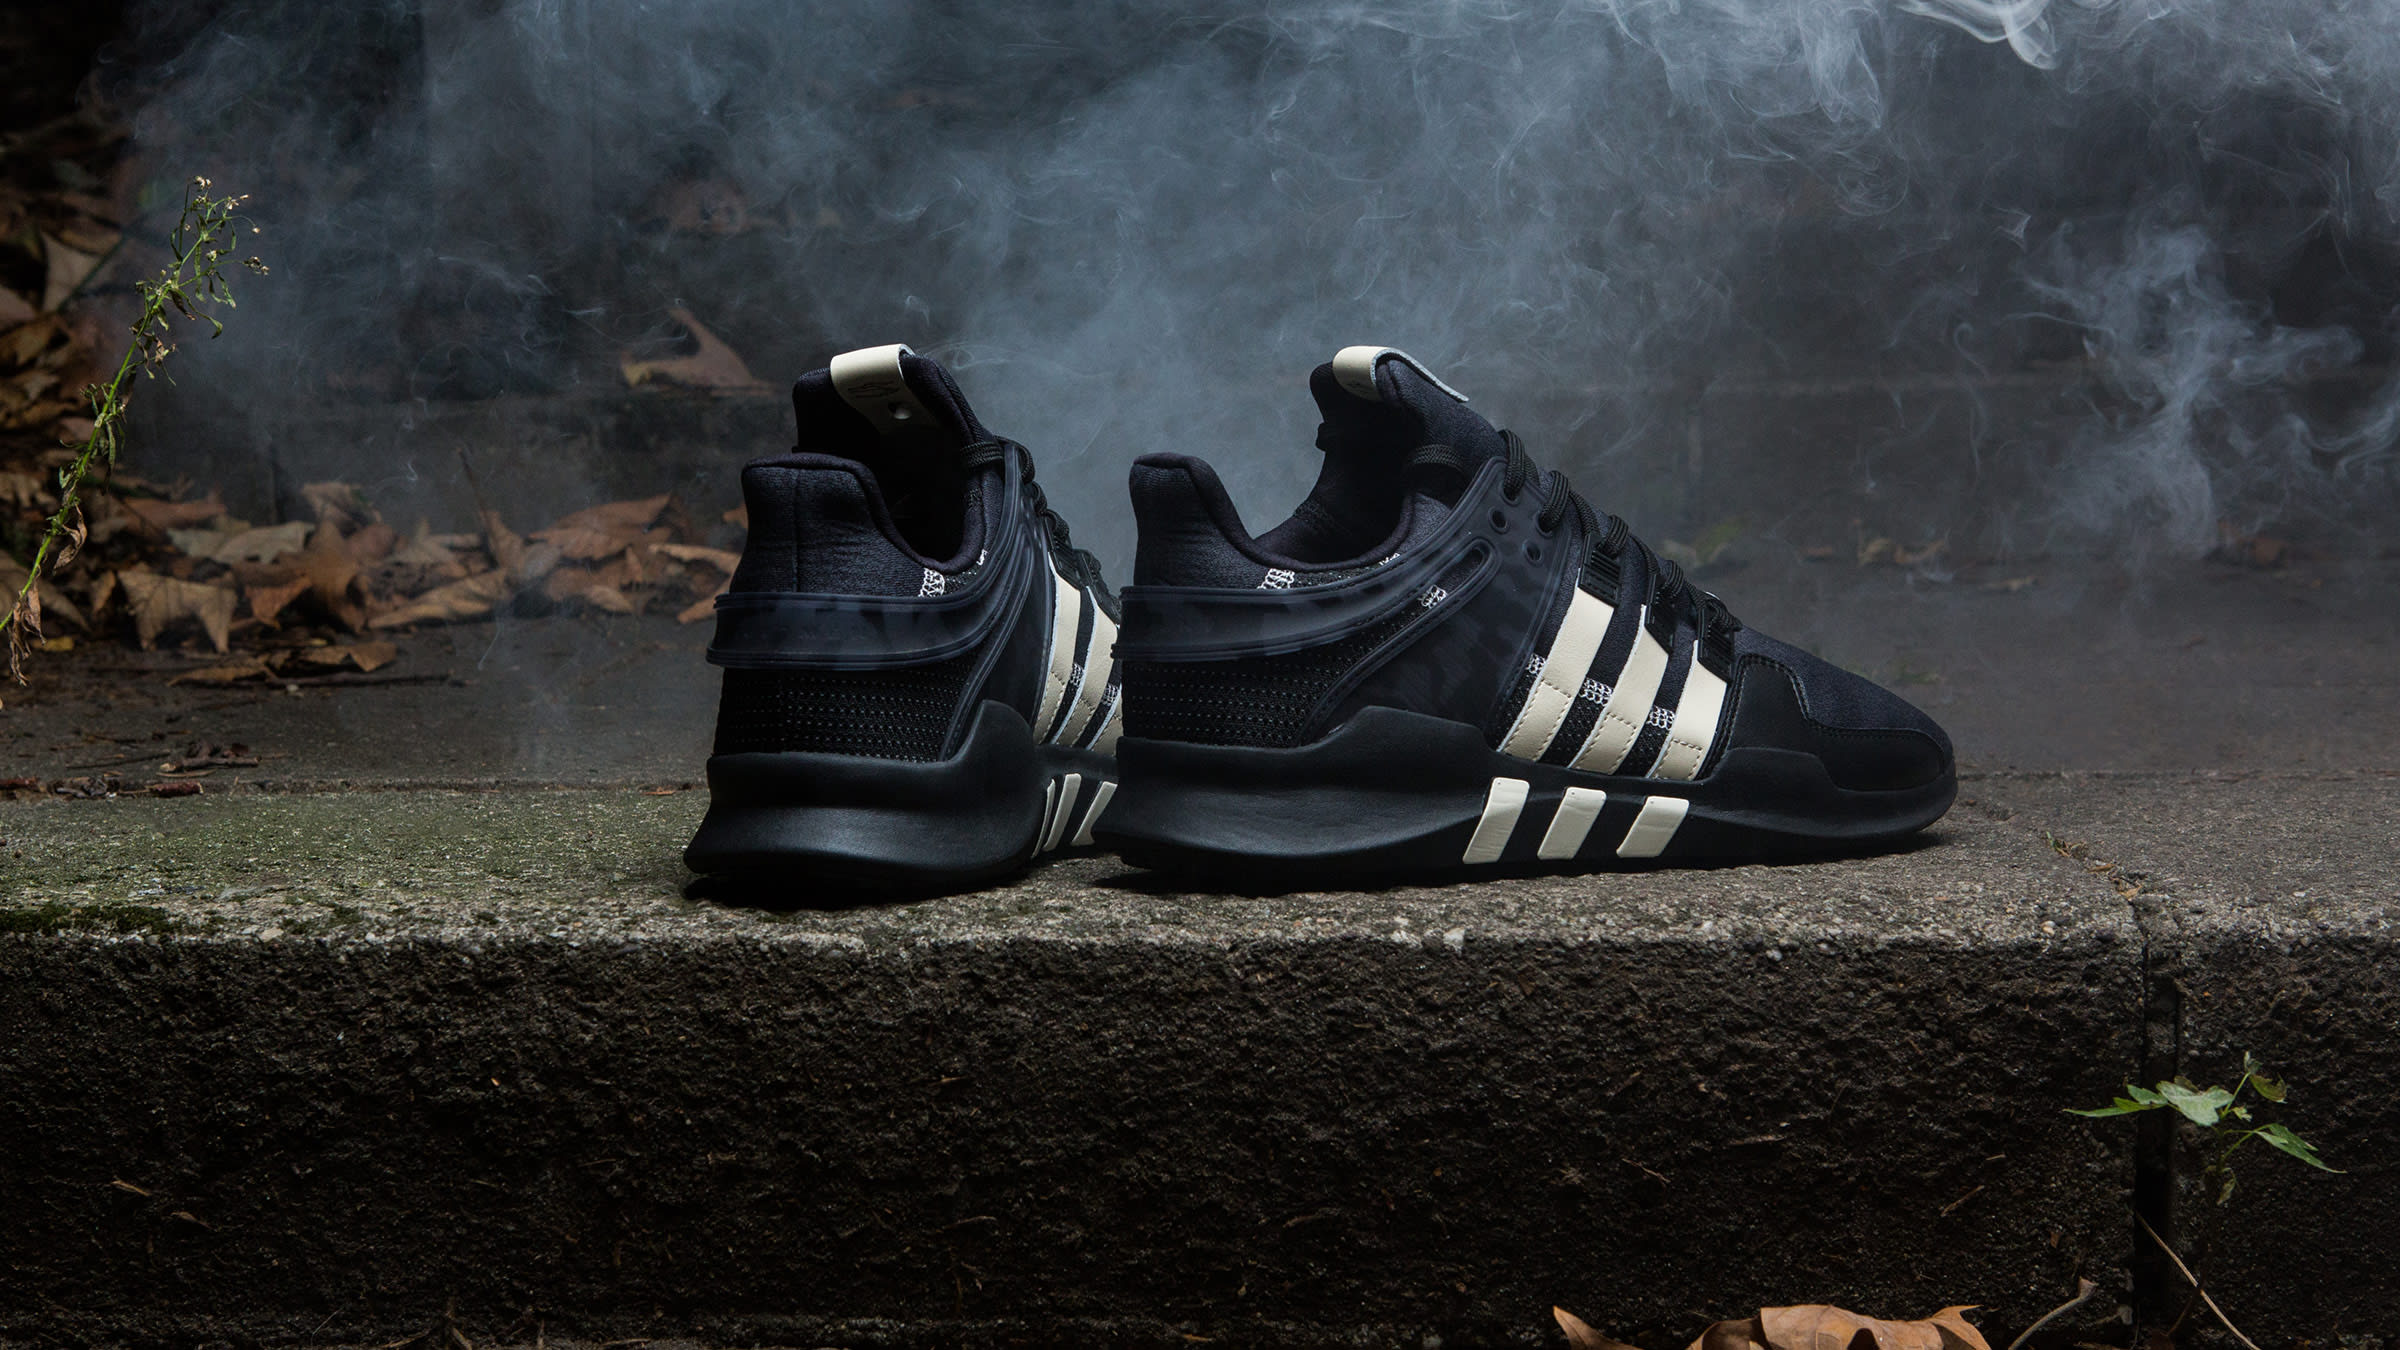 quality design 16c23 9a57d Adidas Consortium x UNDFTD EQT Support ADV